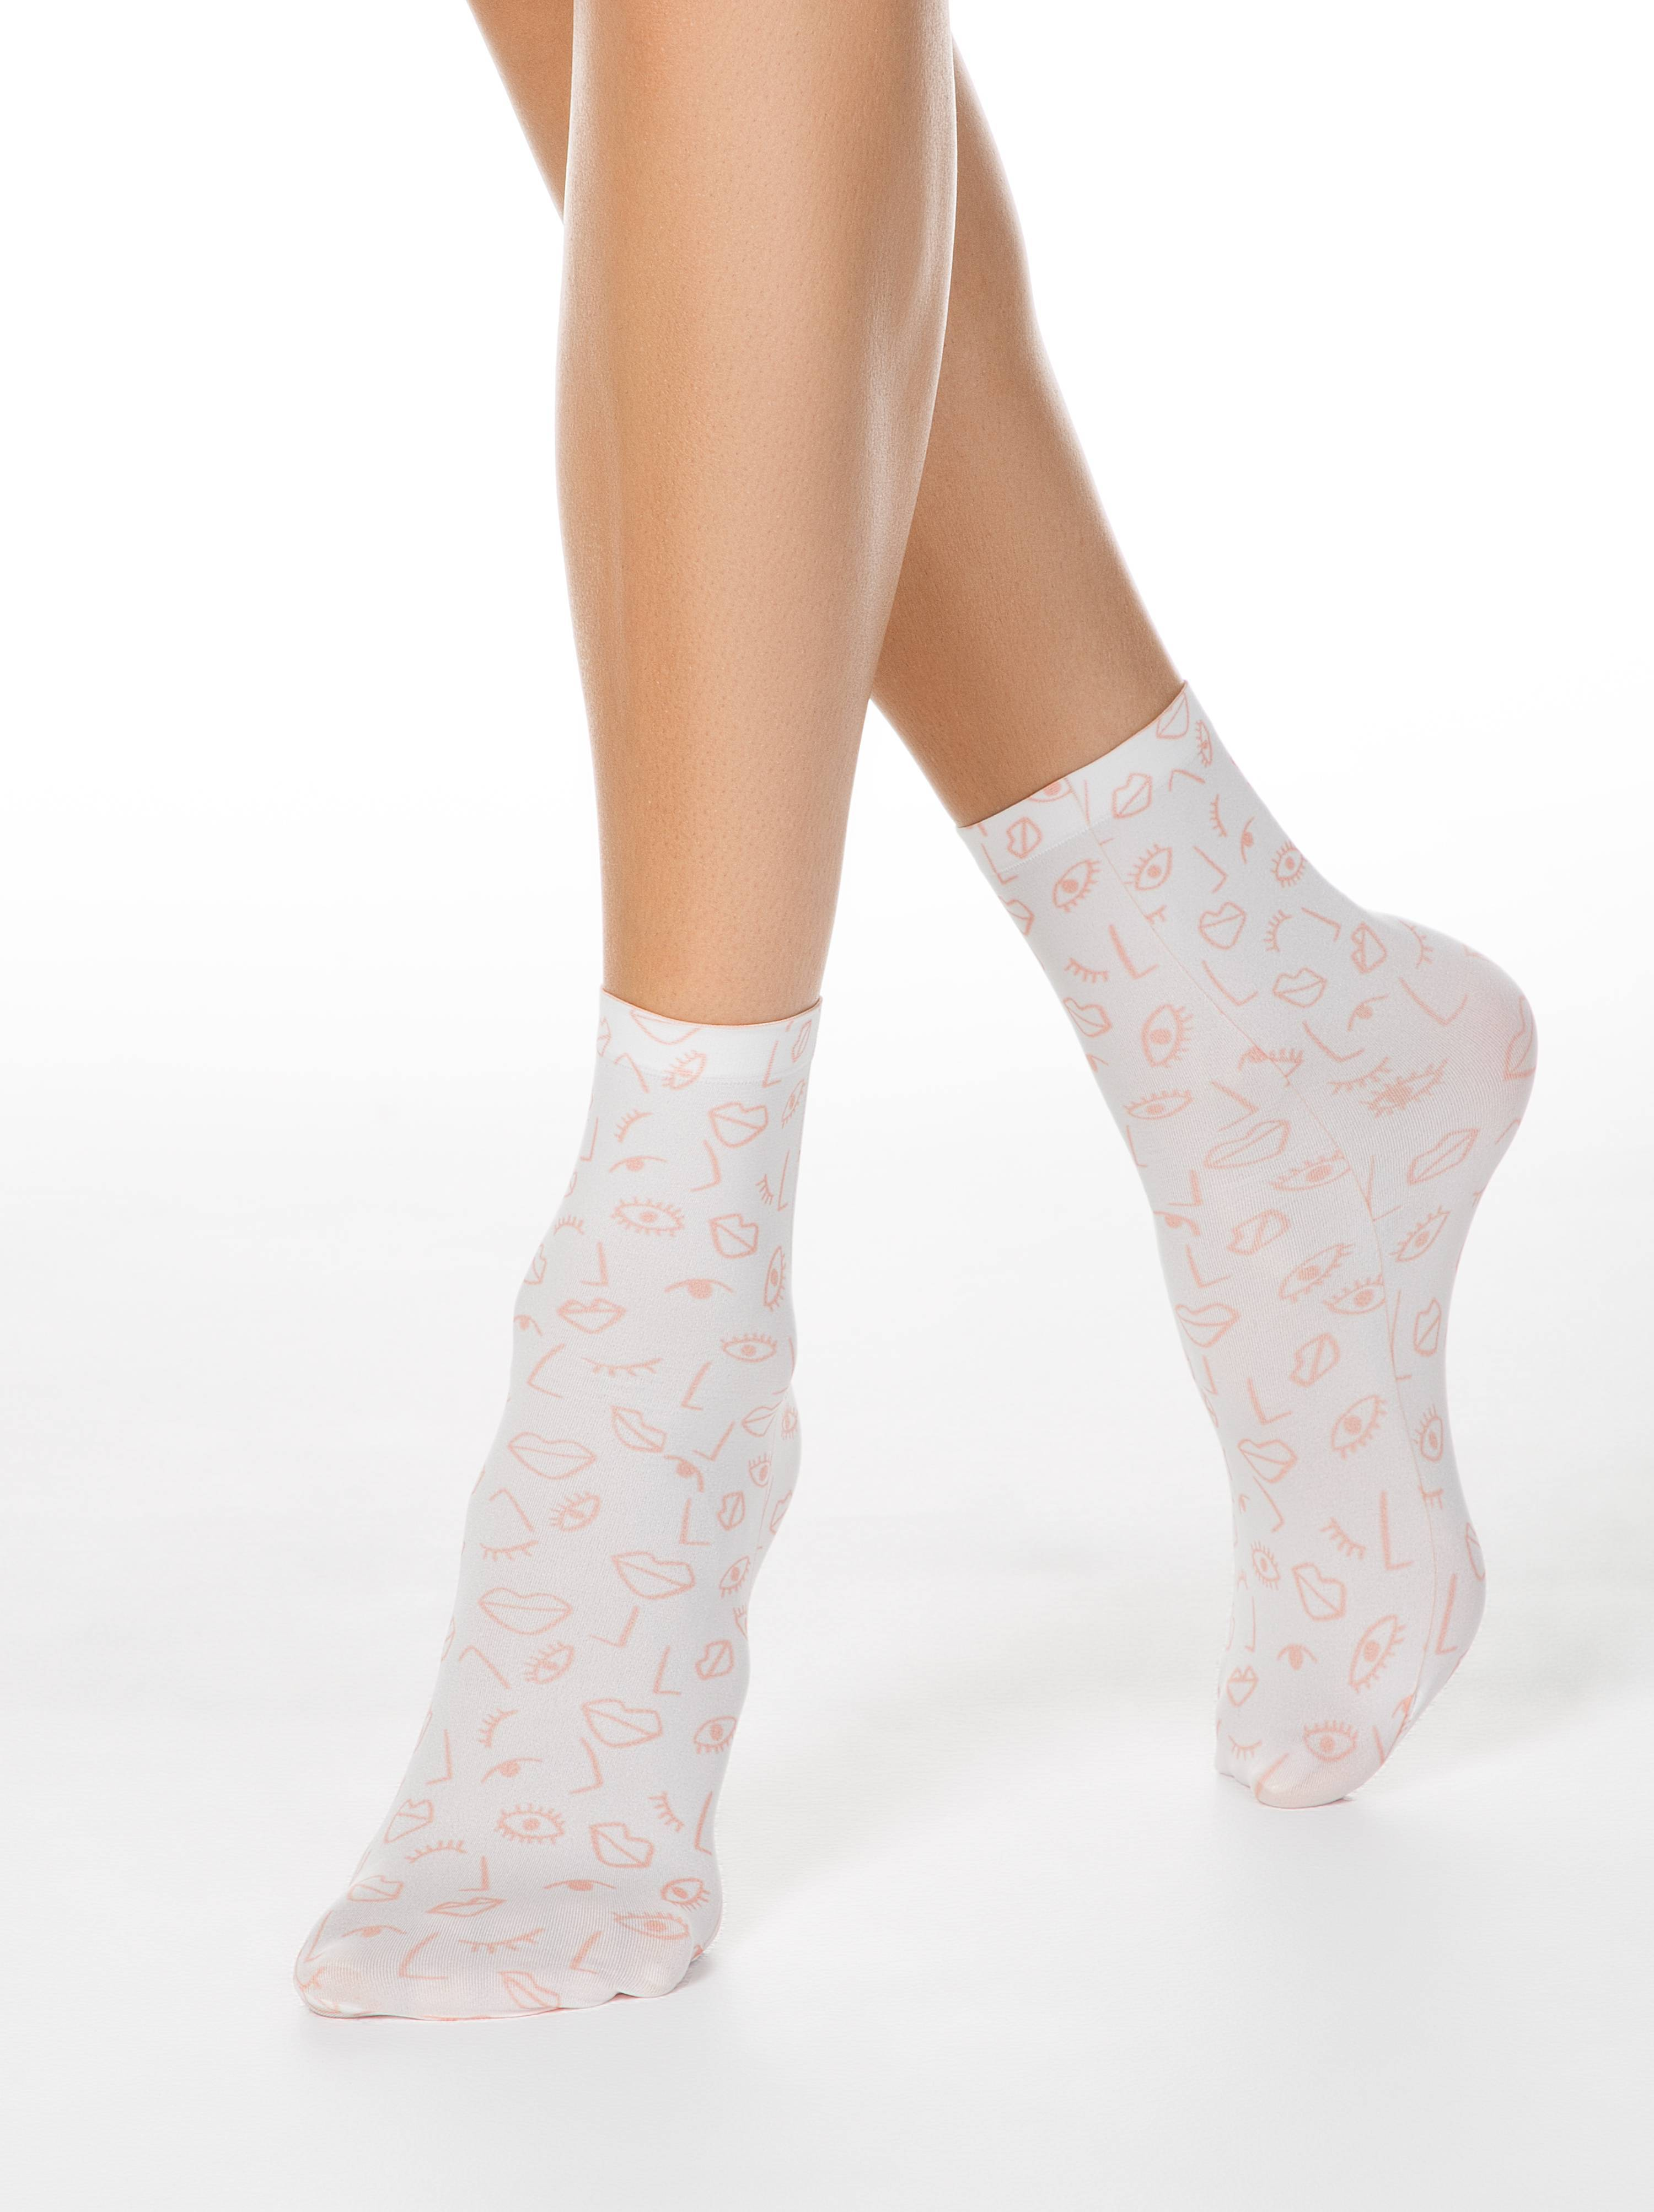 Фото - Носки женские ⭐️ Носки с принтом FANTASY 70 ⭐️ цвет mix